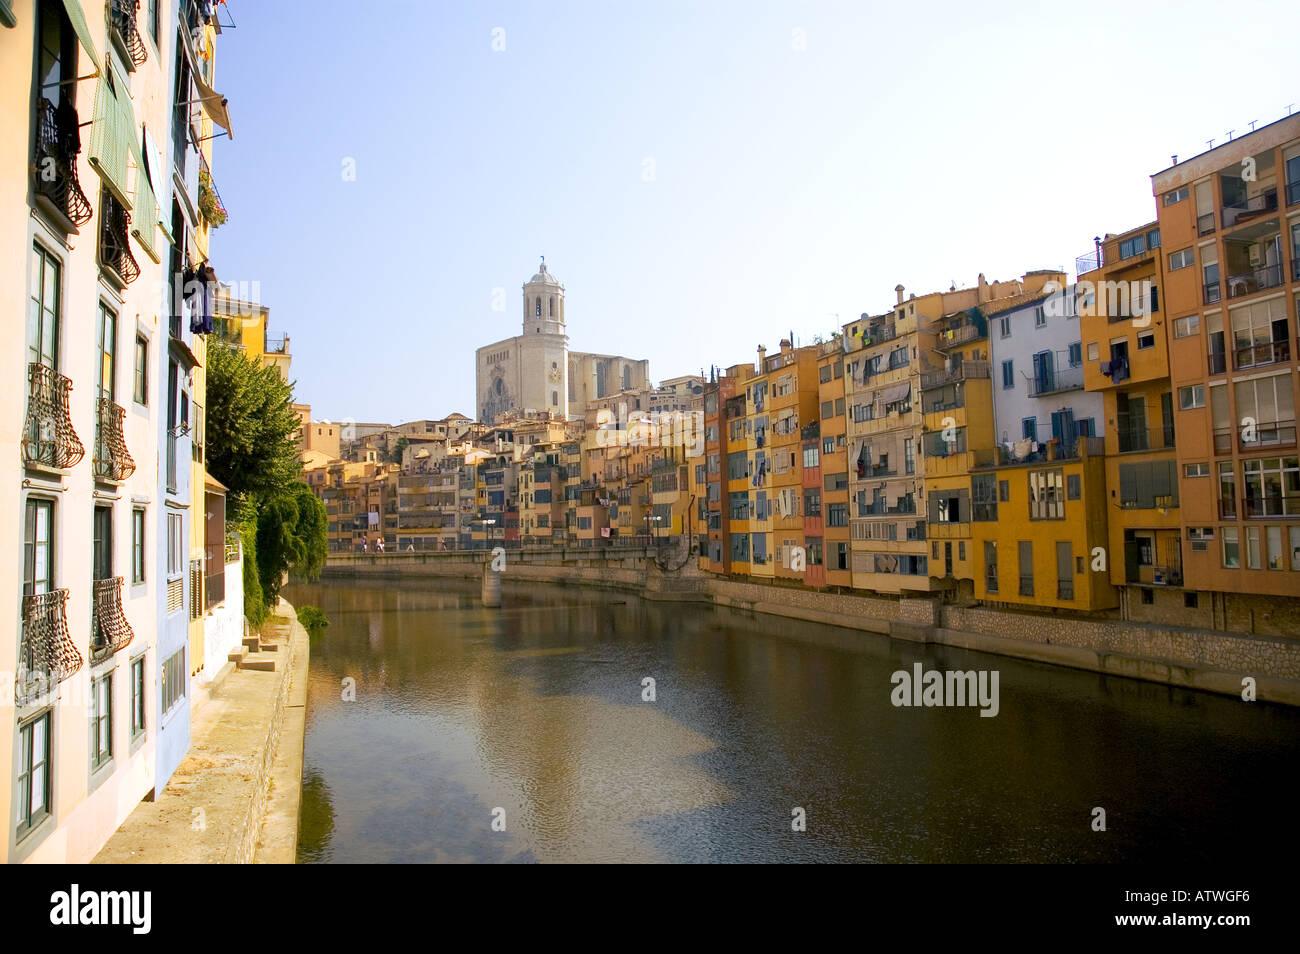 Riverside Appartments am Fluss Onyar, Girona, Katalonien, Spanien. Stockbild